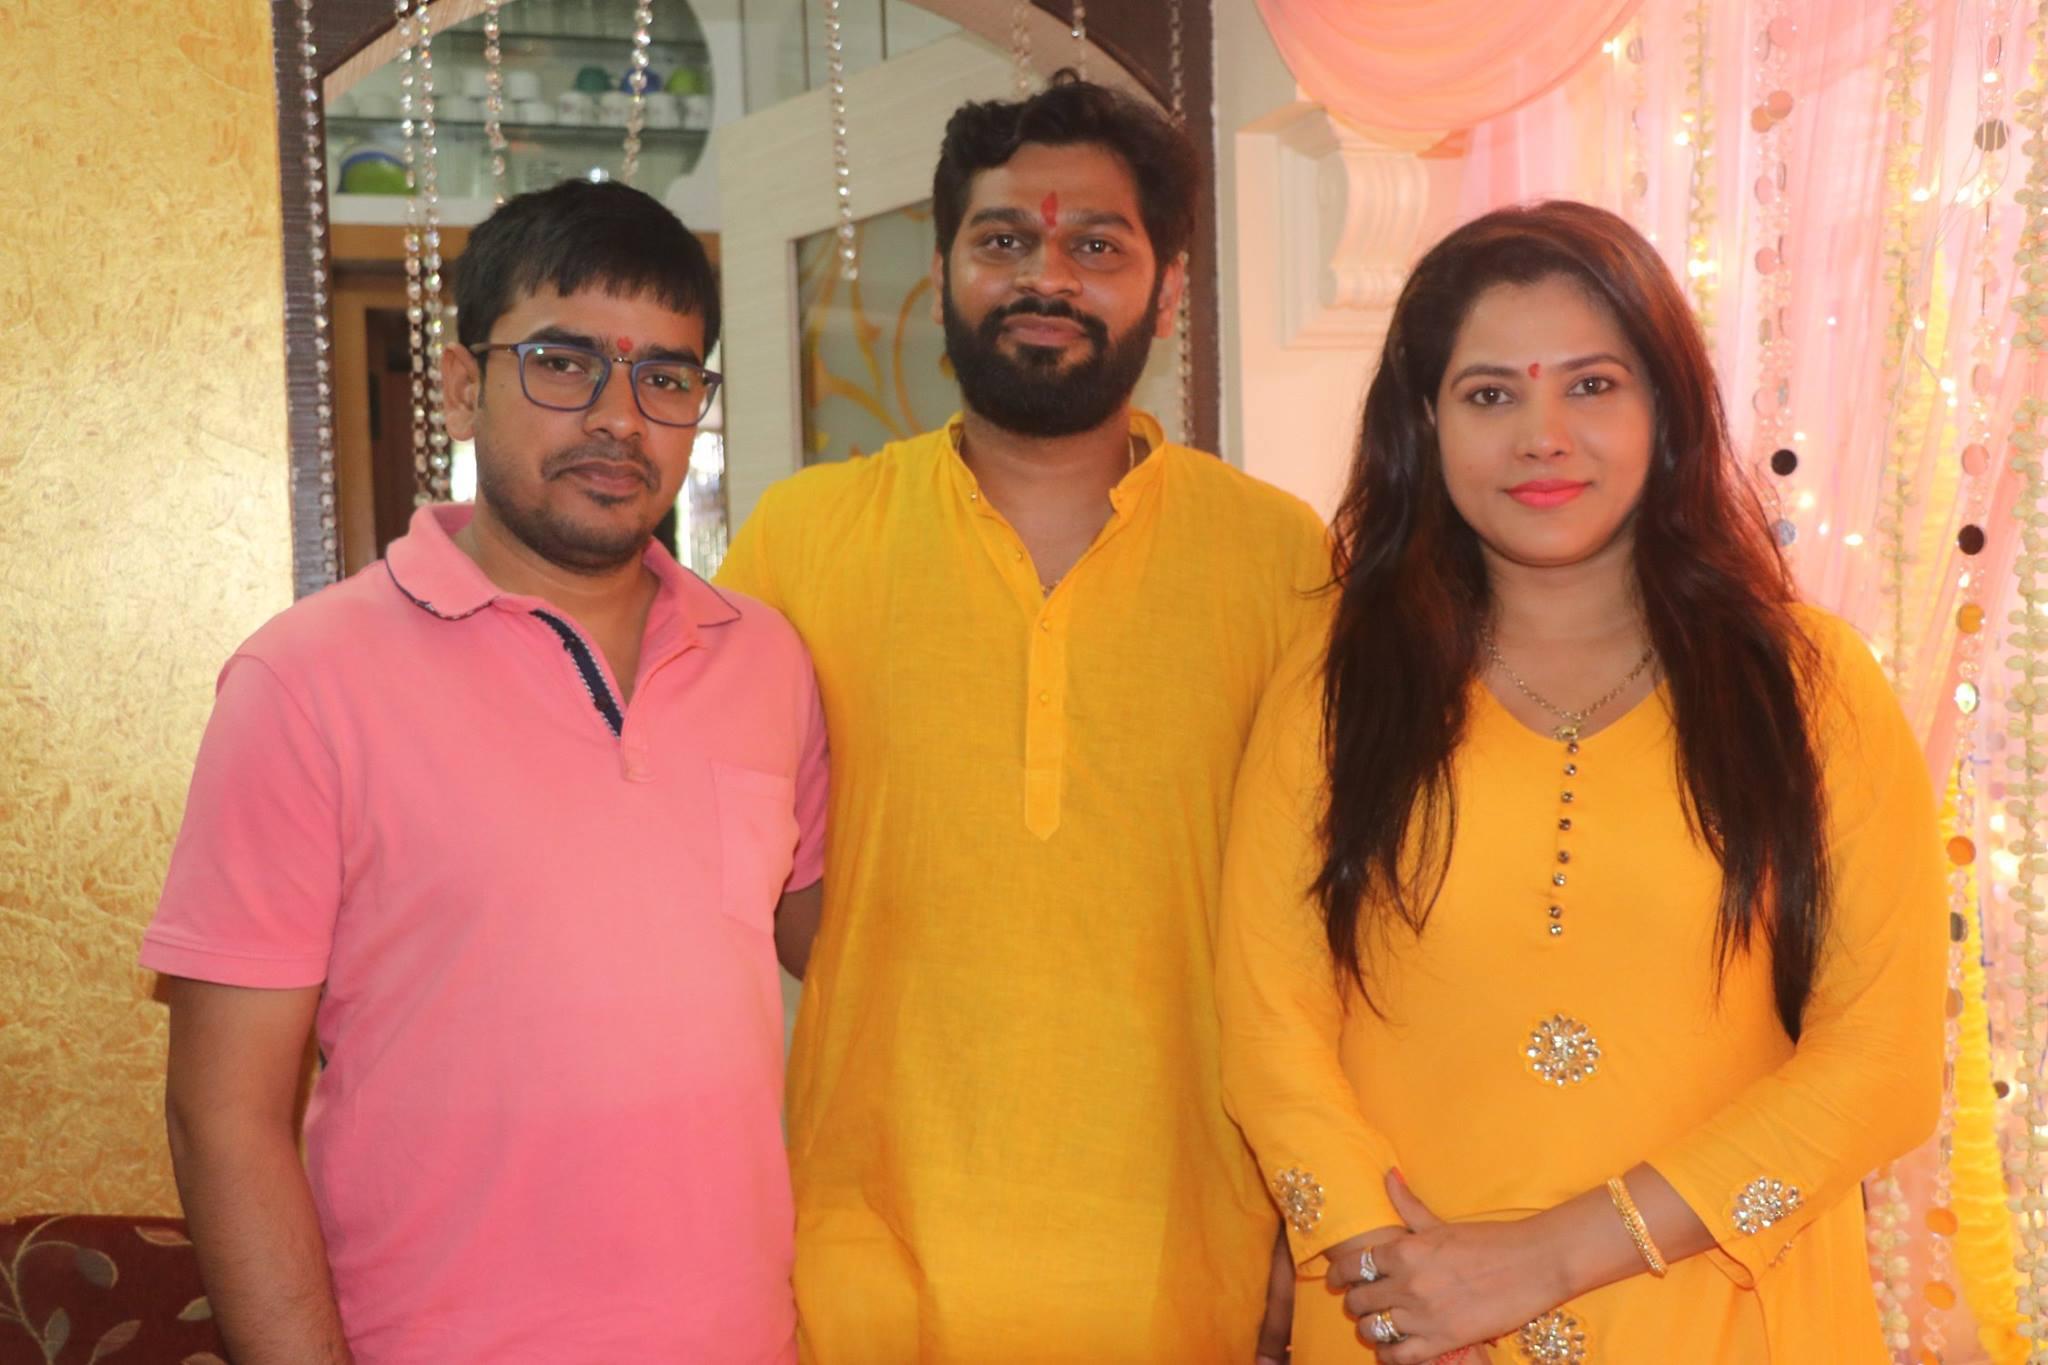 Shubhi Sharma Ravi Kishan, along with many stars of Bhojpuri, Ganpati Bappa